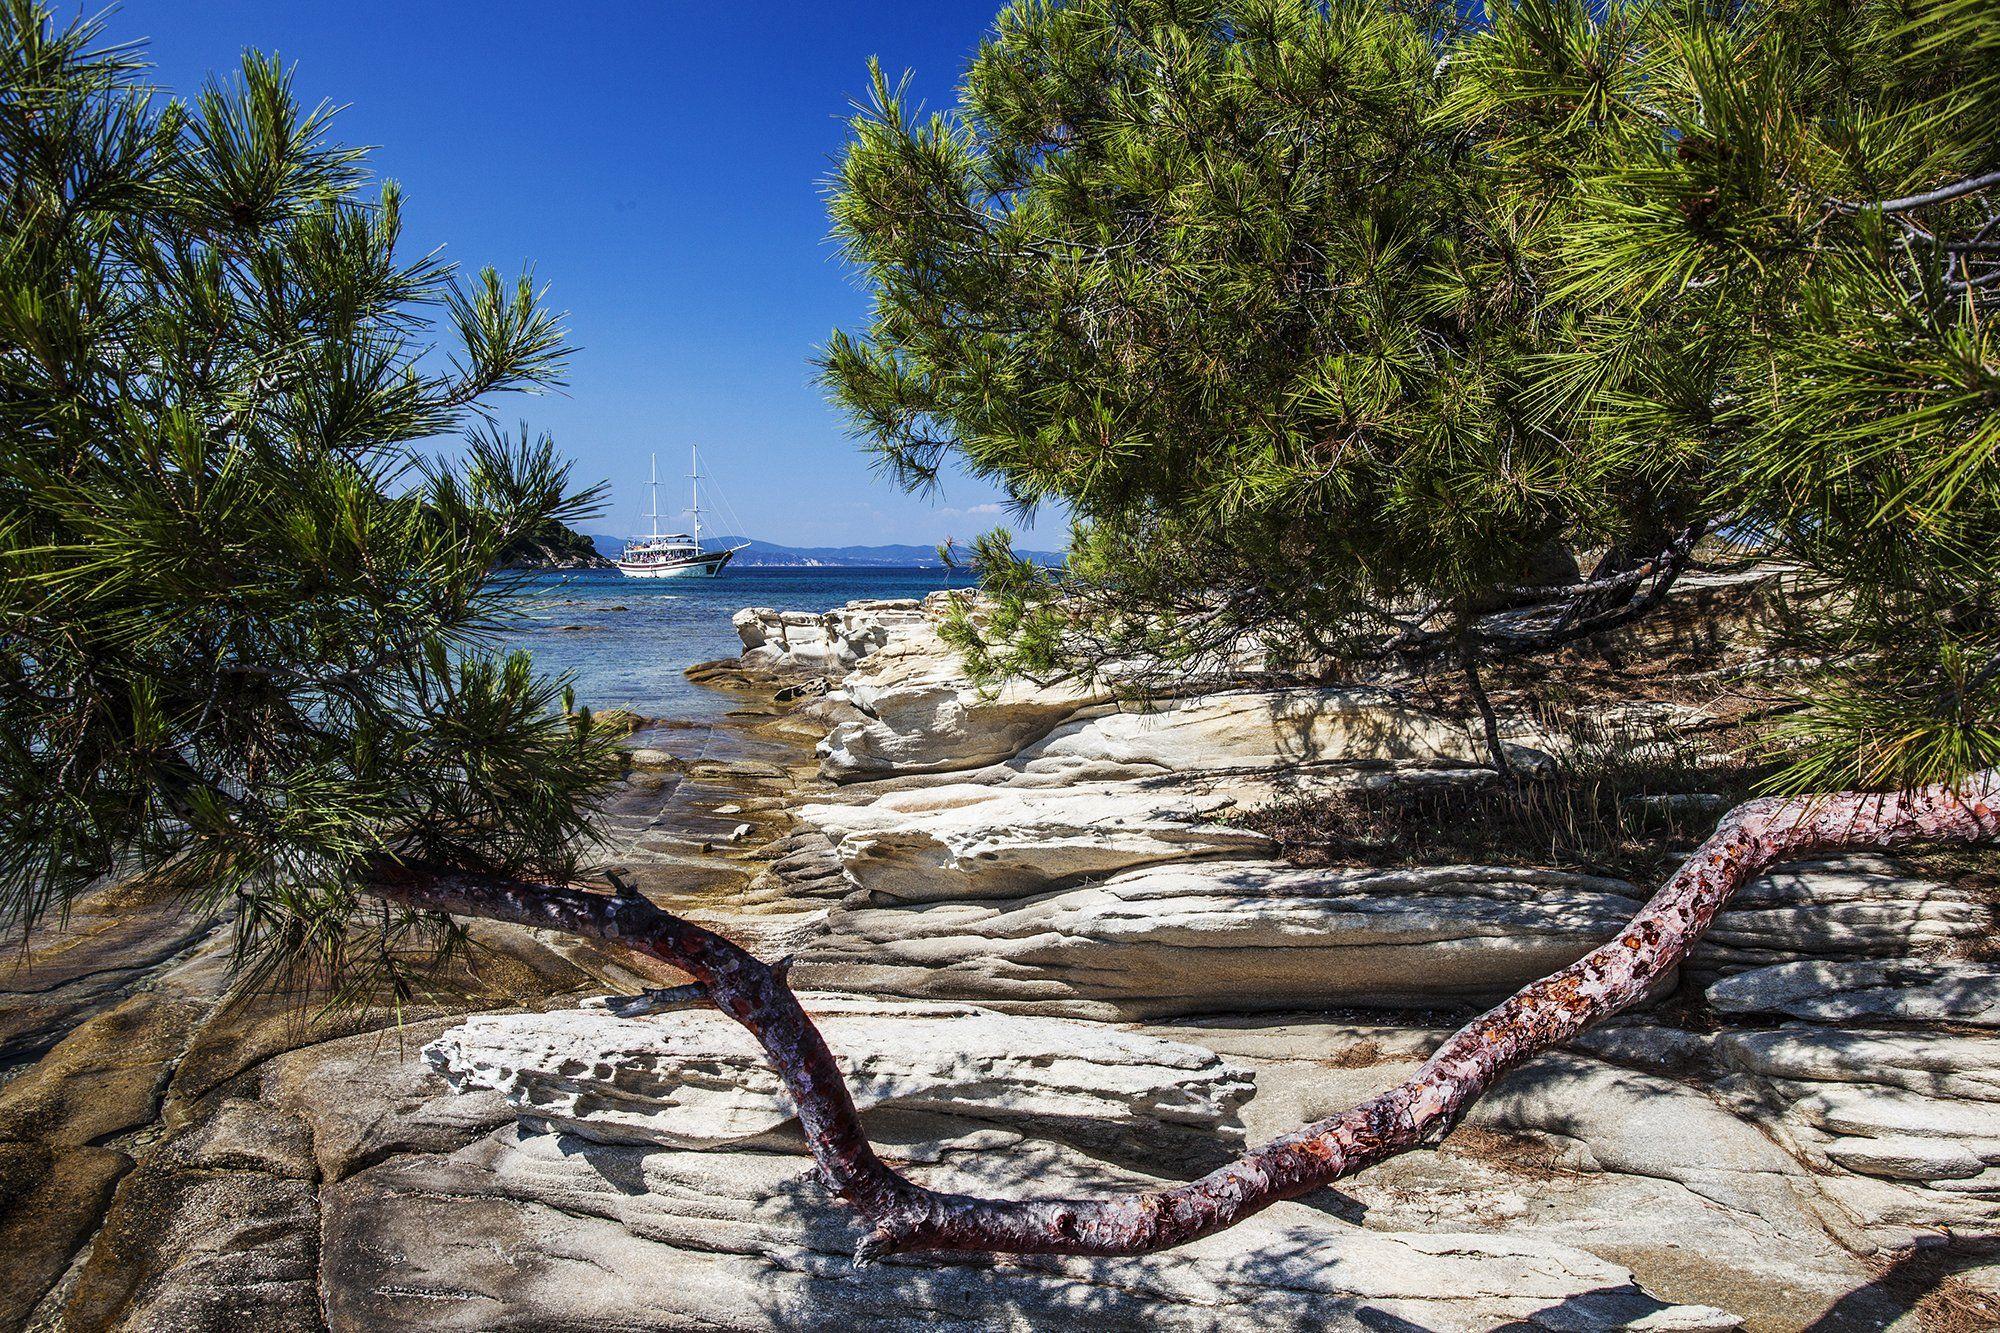 Greece, Halkidiki, Sithonia, blue-green sea, blue sky, white ship rocks., Borislav Tolev